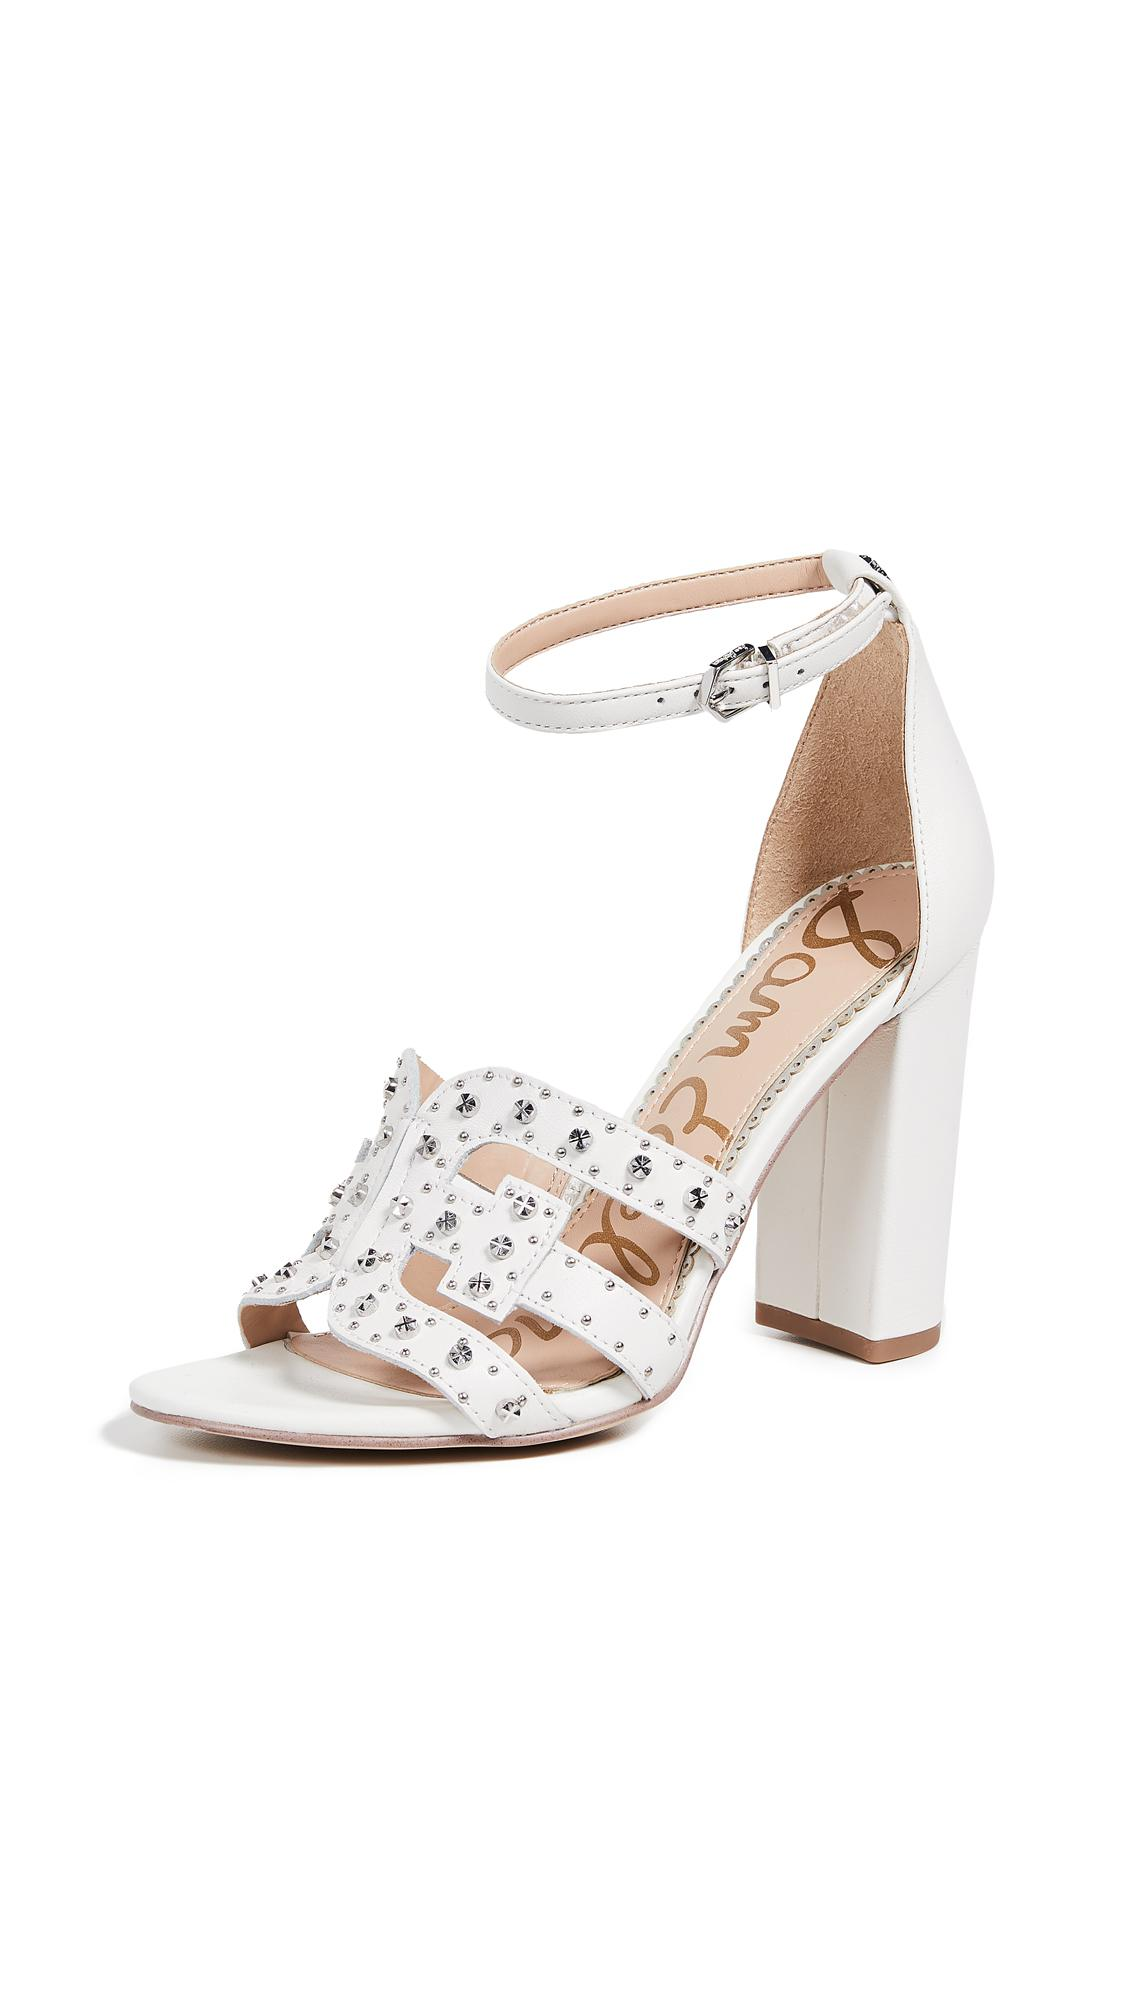 5d43542995e Lyst - Sam Edelman Yasha Sandals in White - Save 61%